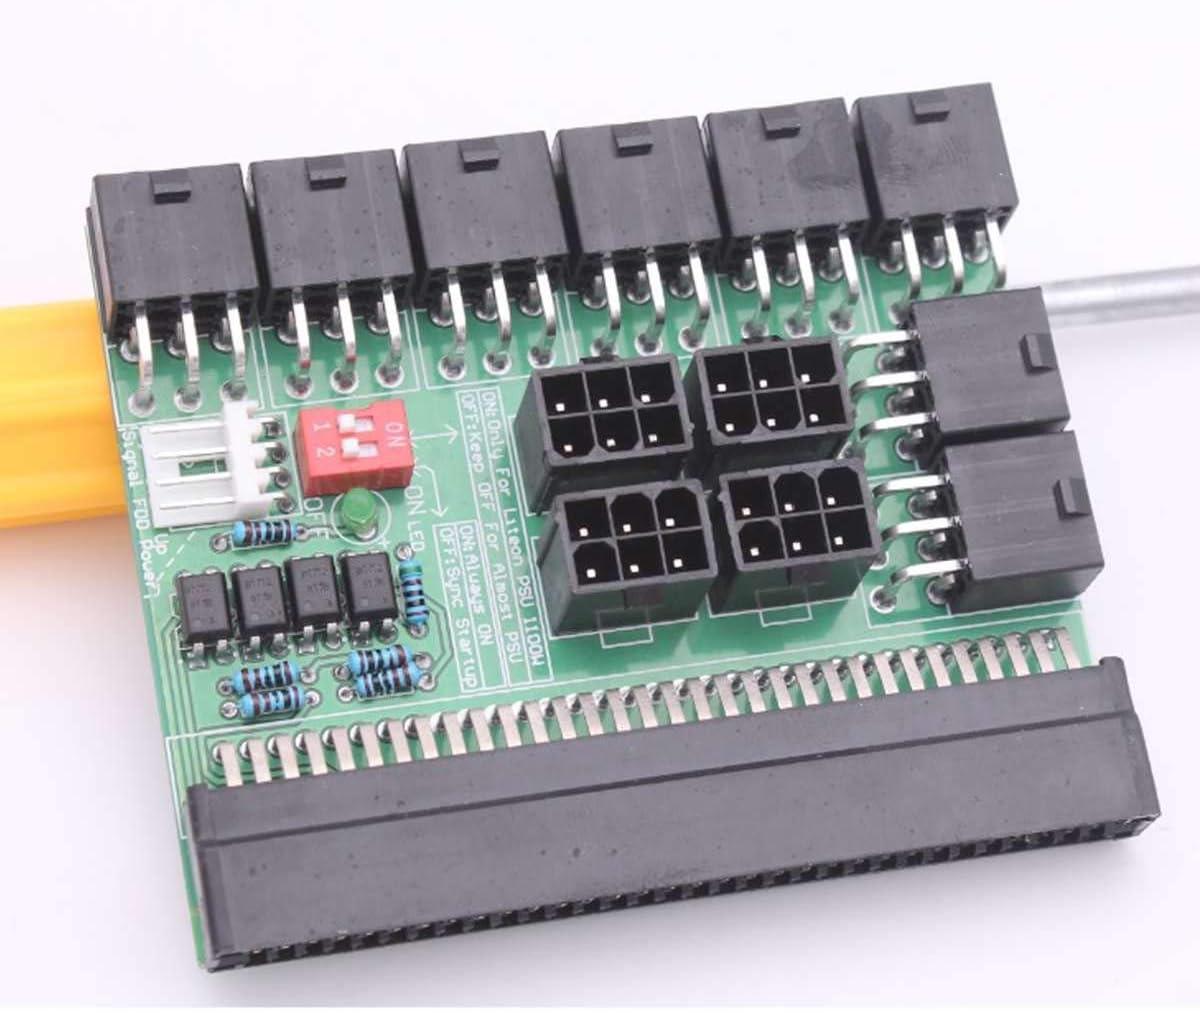 Sala-Deco DPS-1200FB//QB A 12 Pins Ports Power Supply Breakout Board Adapter For Ethereum PSU GPU Mining